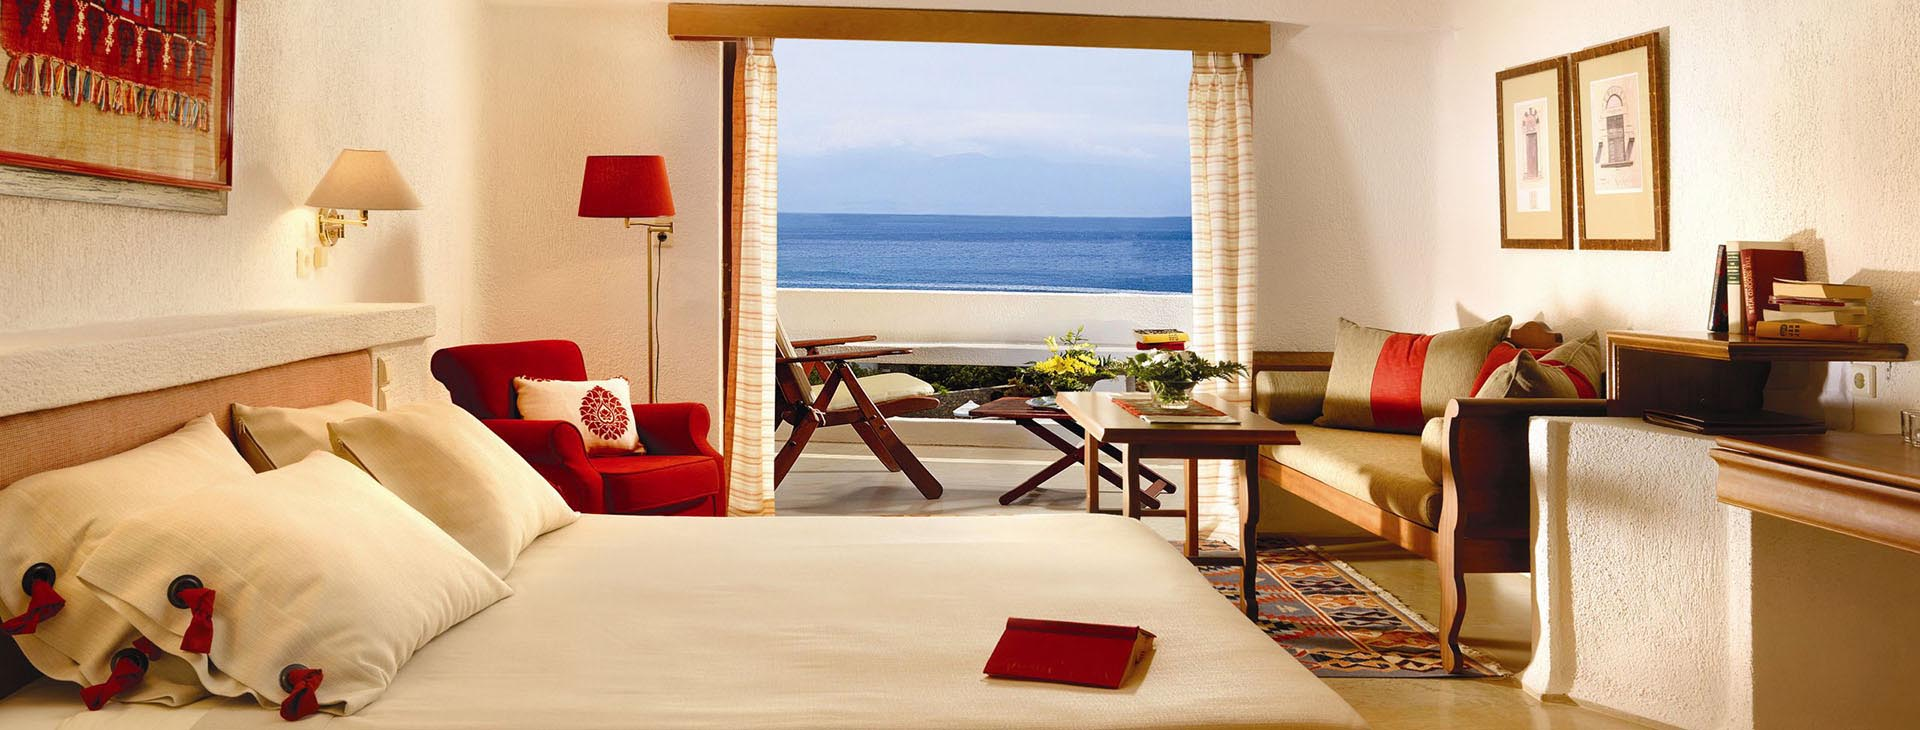 Elounda Mare Hotel - Relais Châteaux - Rooms